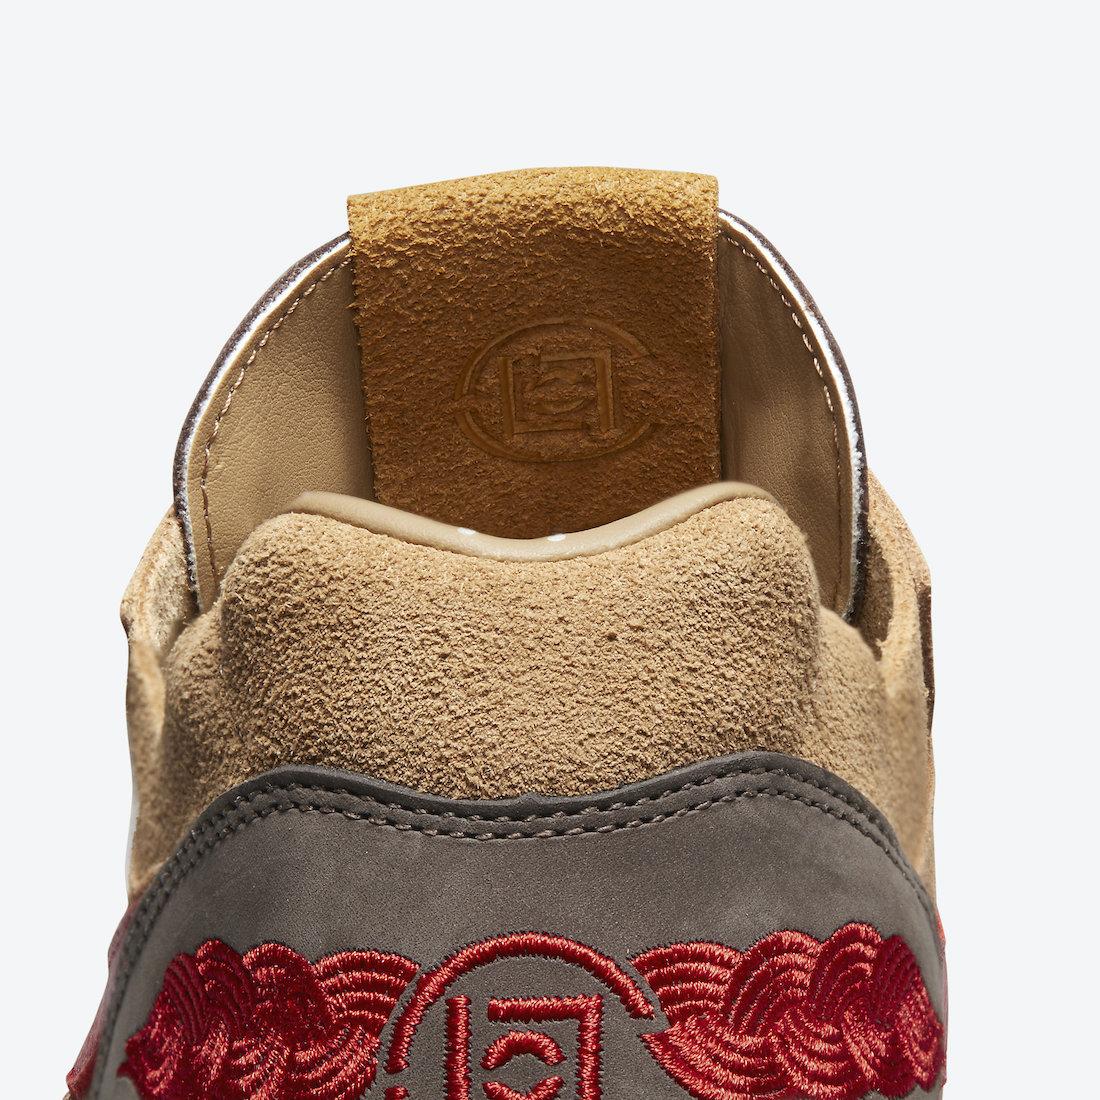 Clot-Nike-Air-Max-1-KOD-CHA-DD1870-200-Release-Date-8